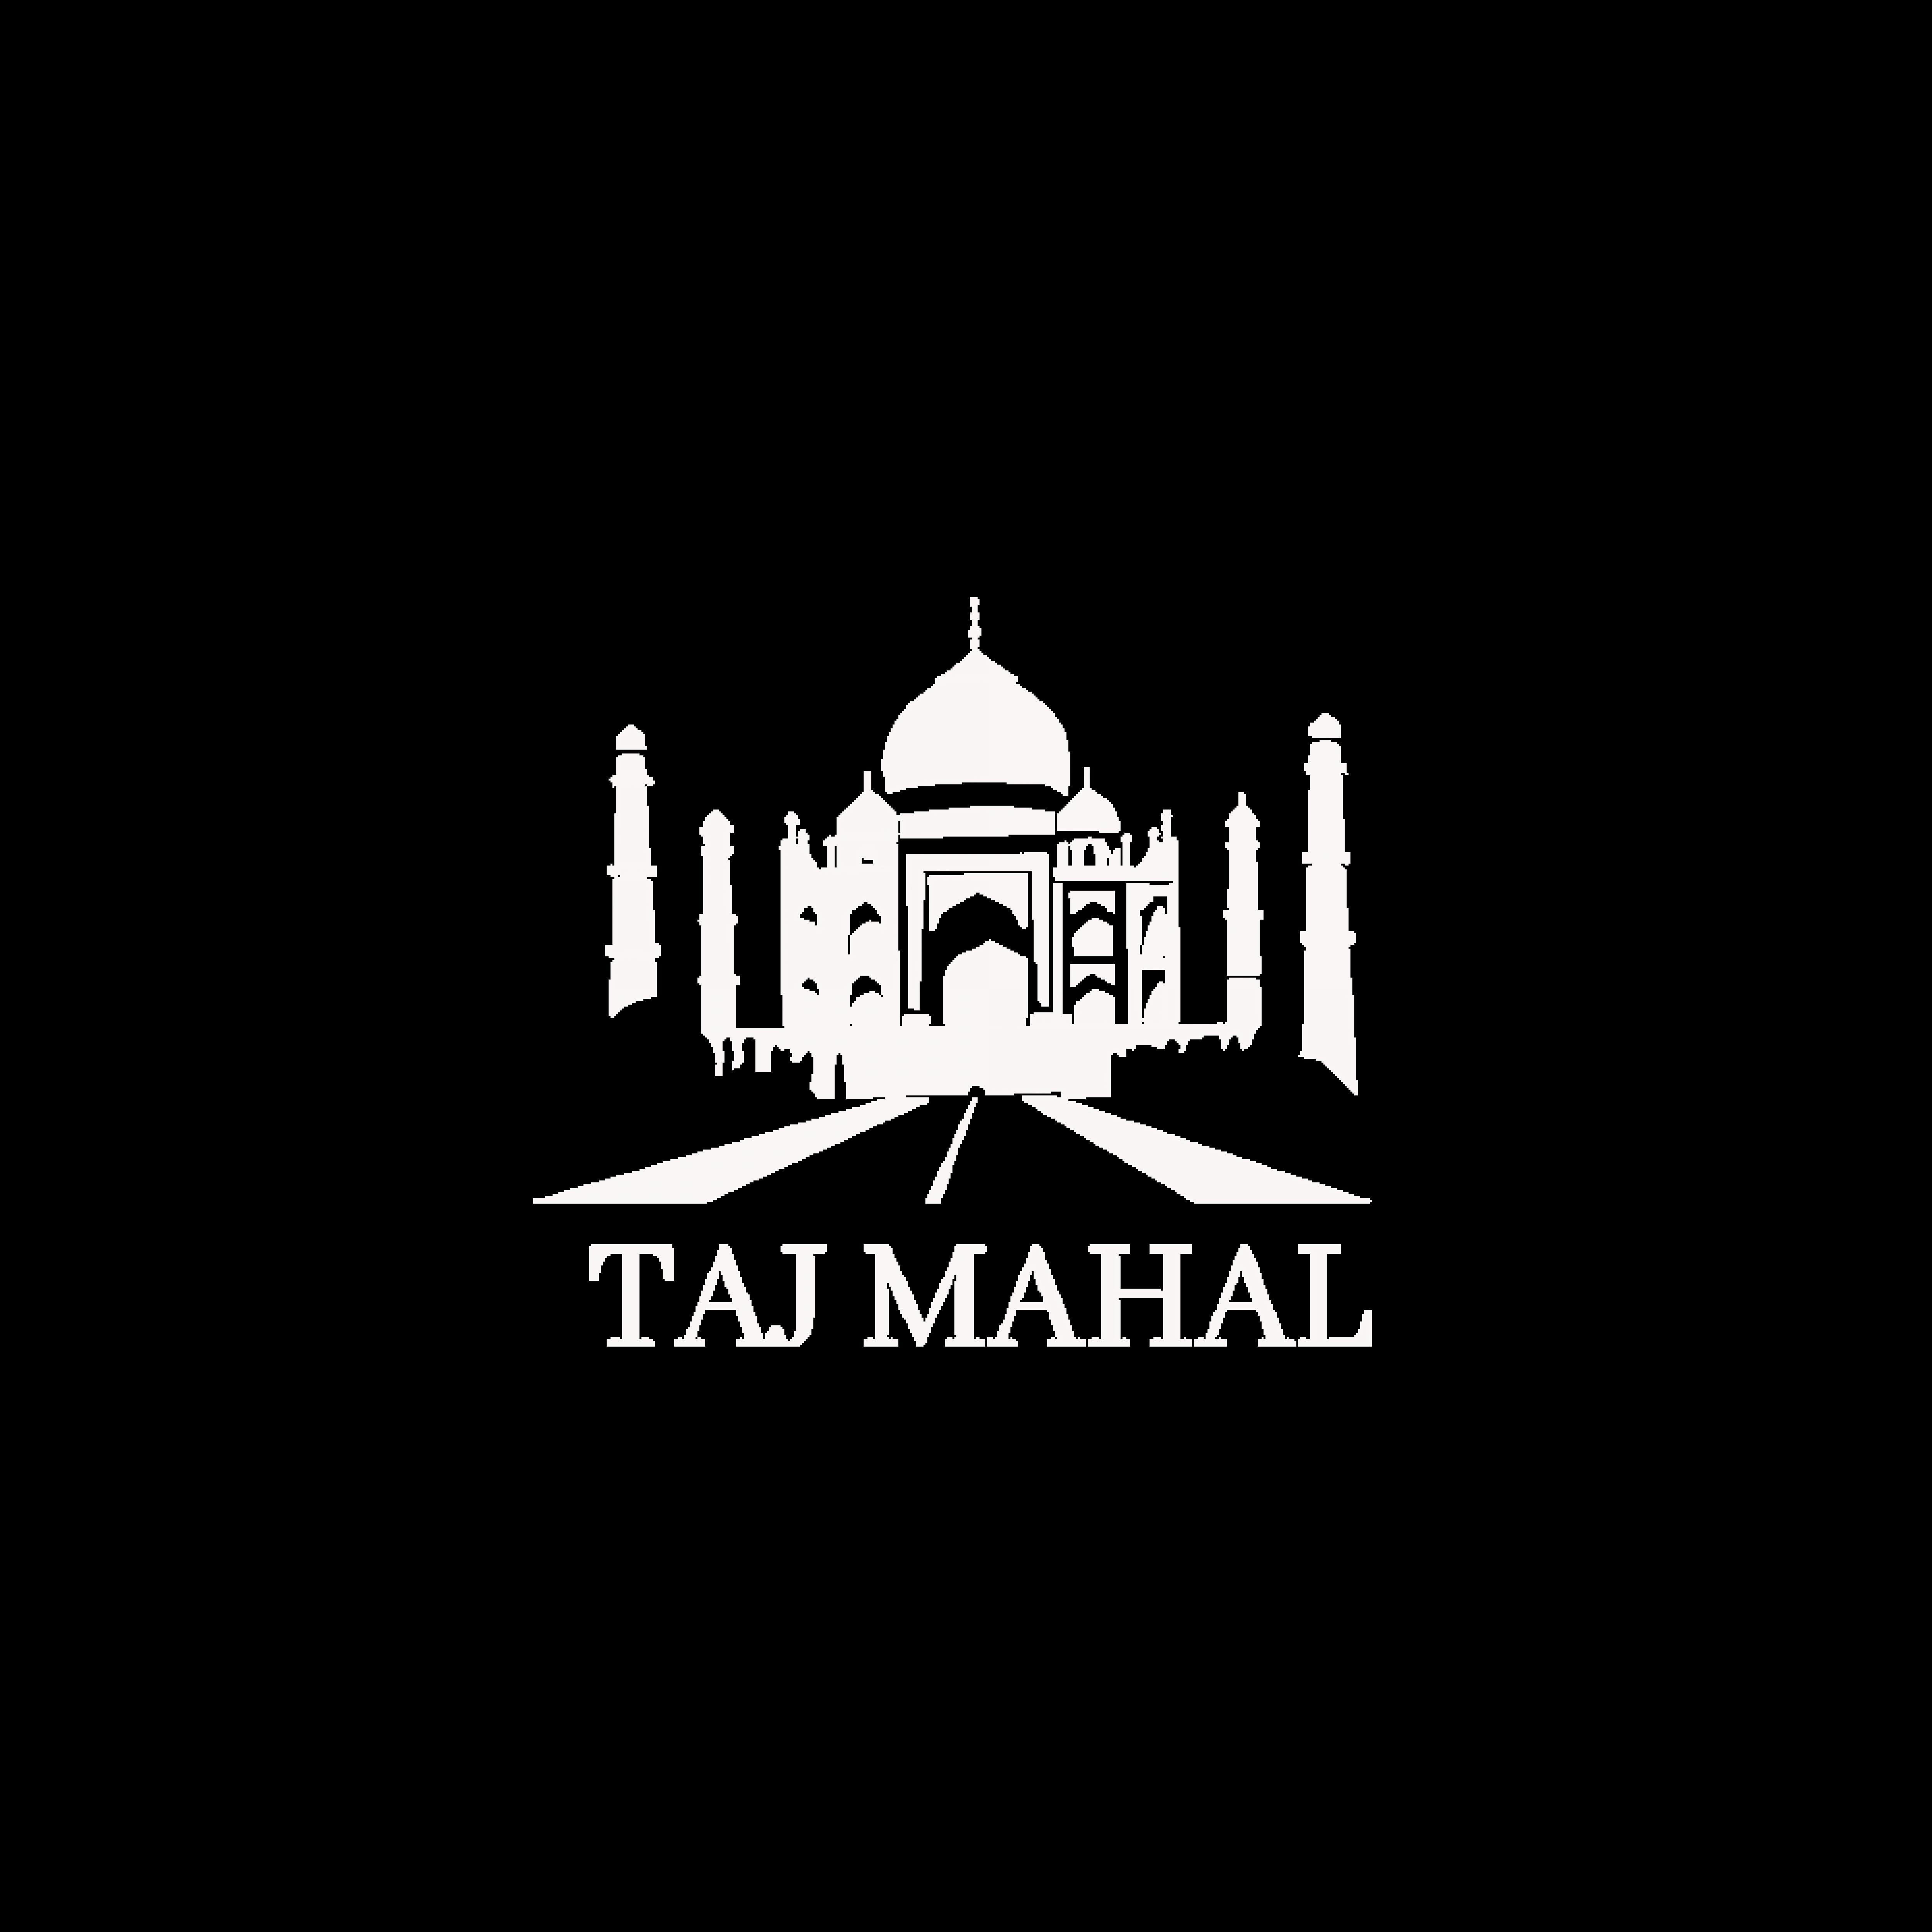 Taj-Mahal-Transparent-PNG